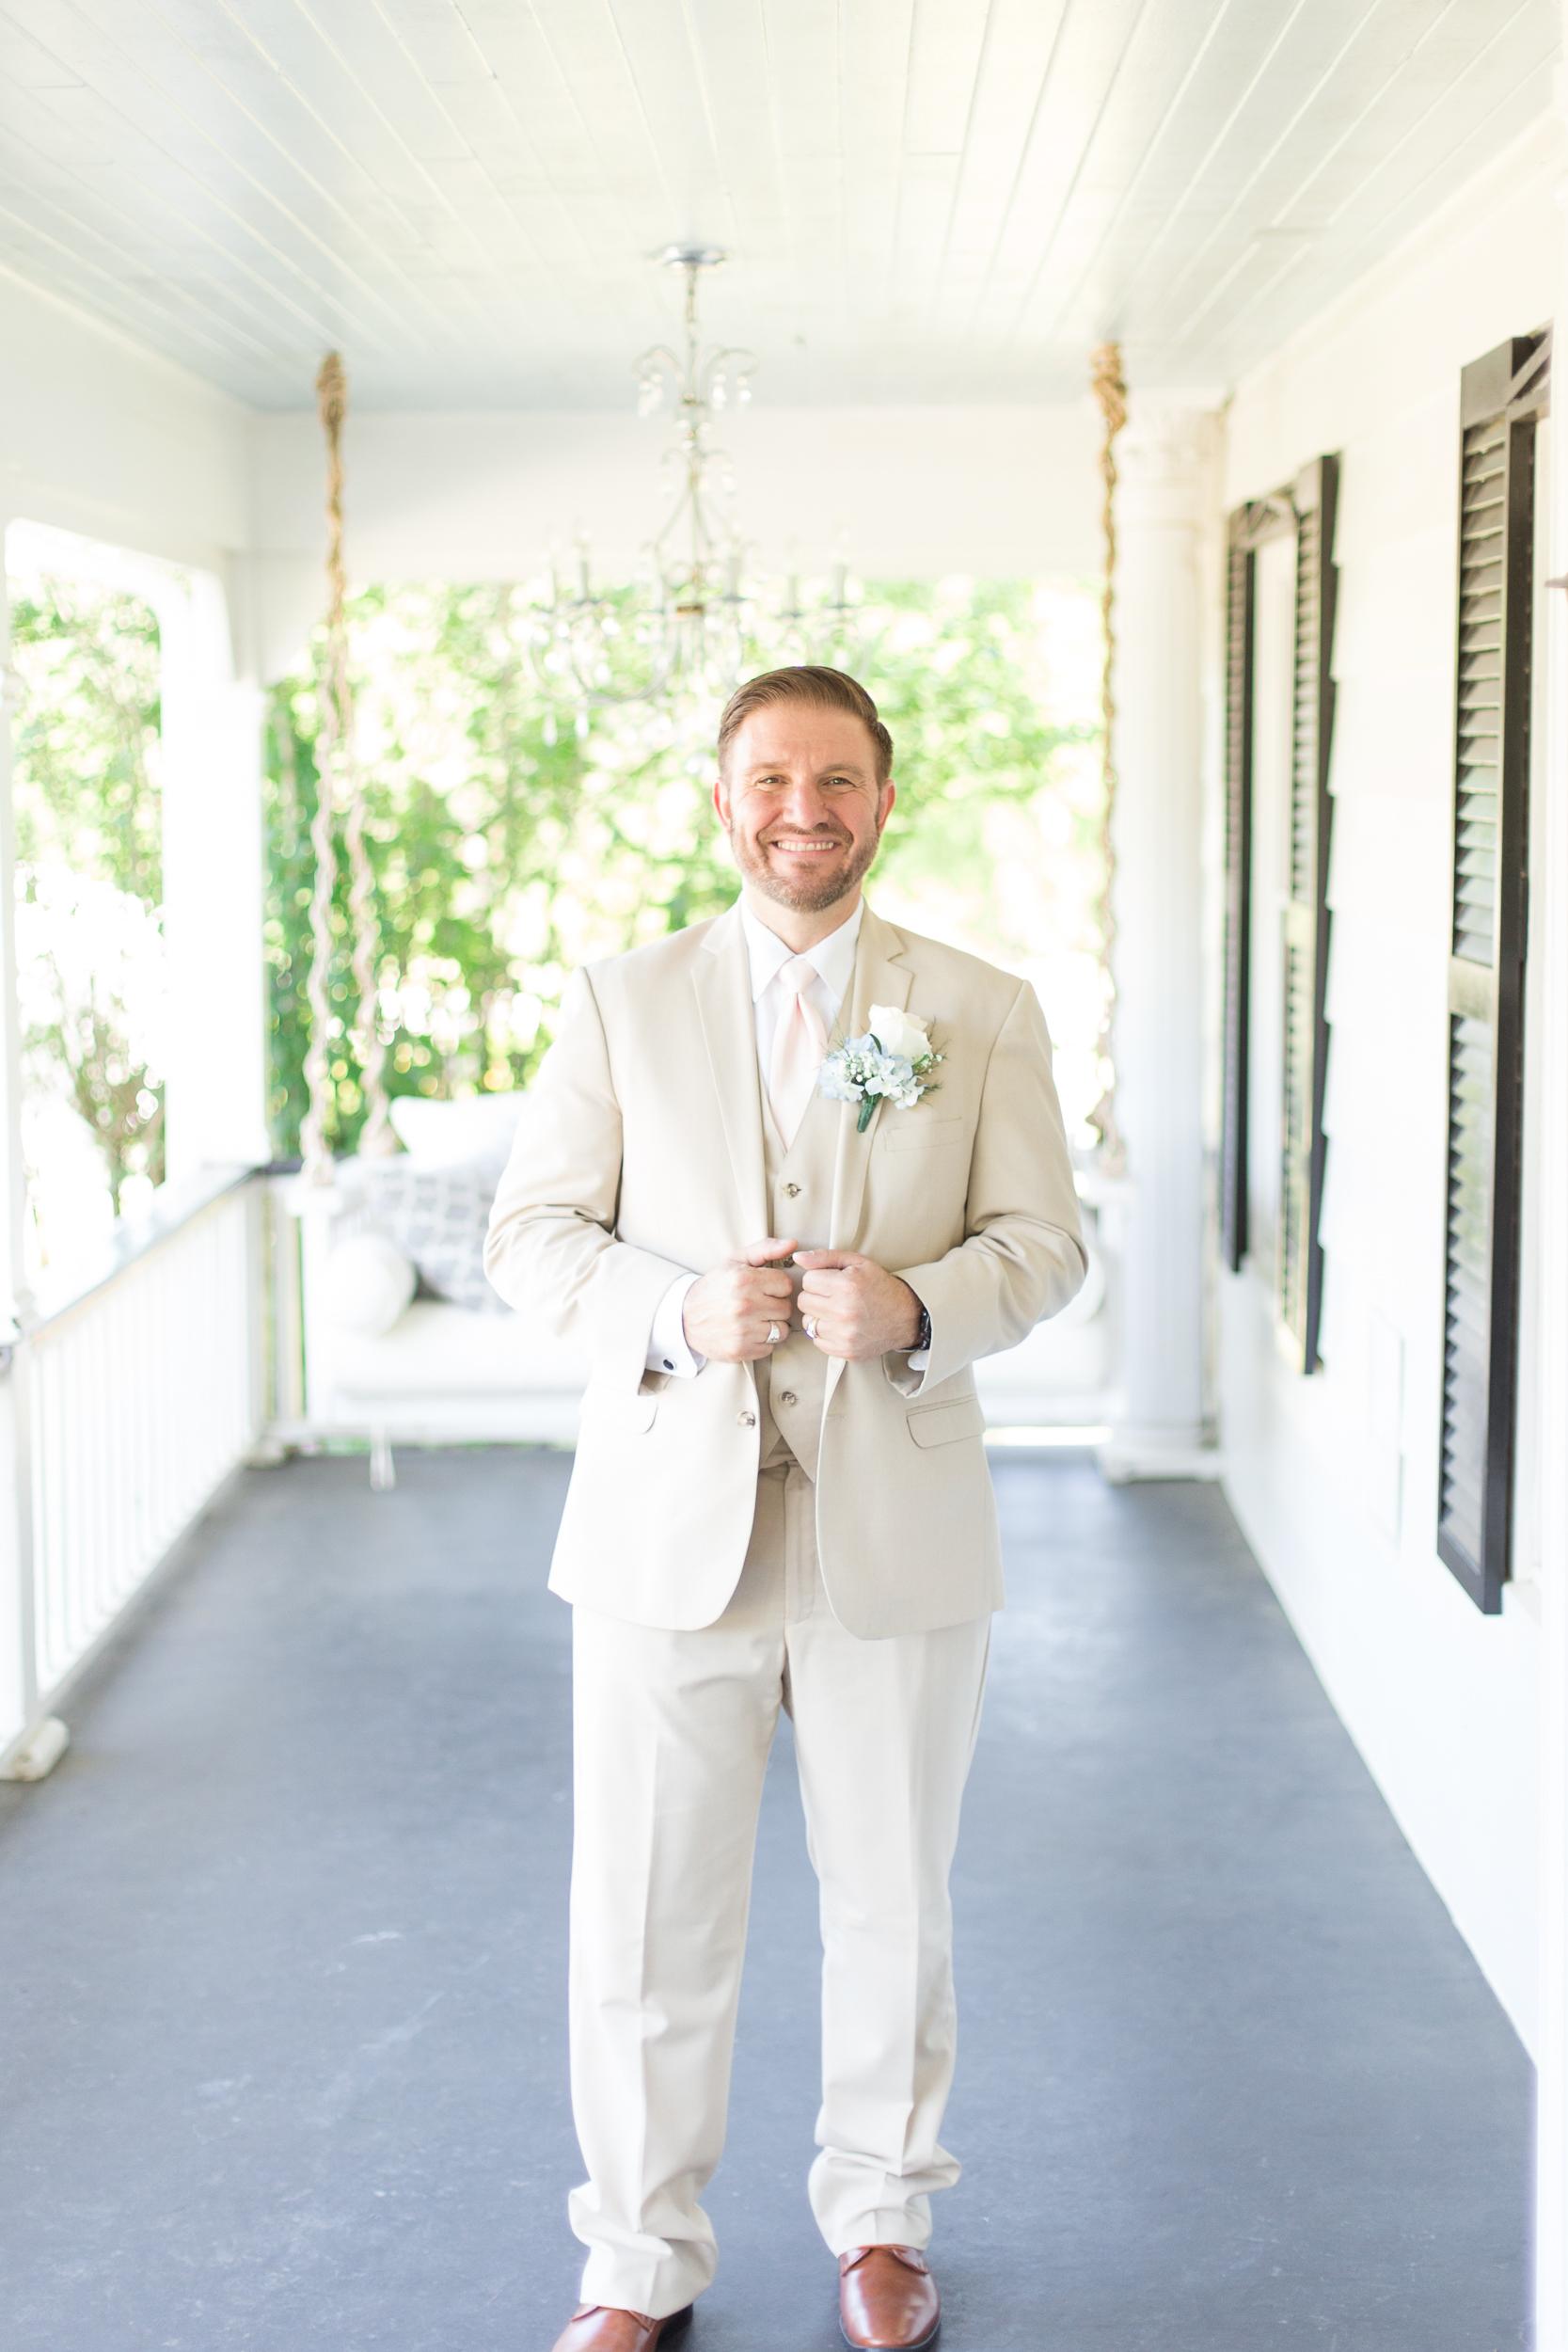 Zihlman-East TX Wedding_Kelsie Hendricks Photography_The Folmar Tyler Texas-87.jpg